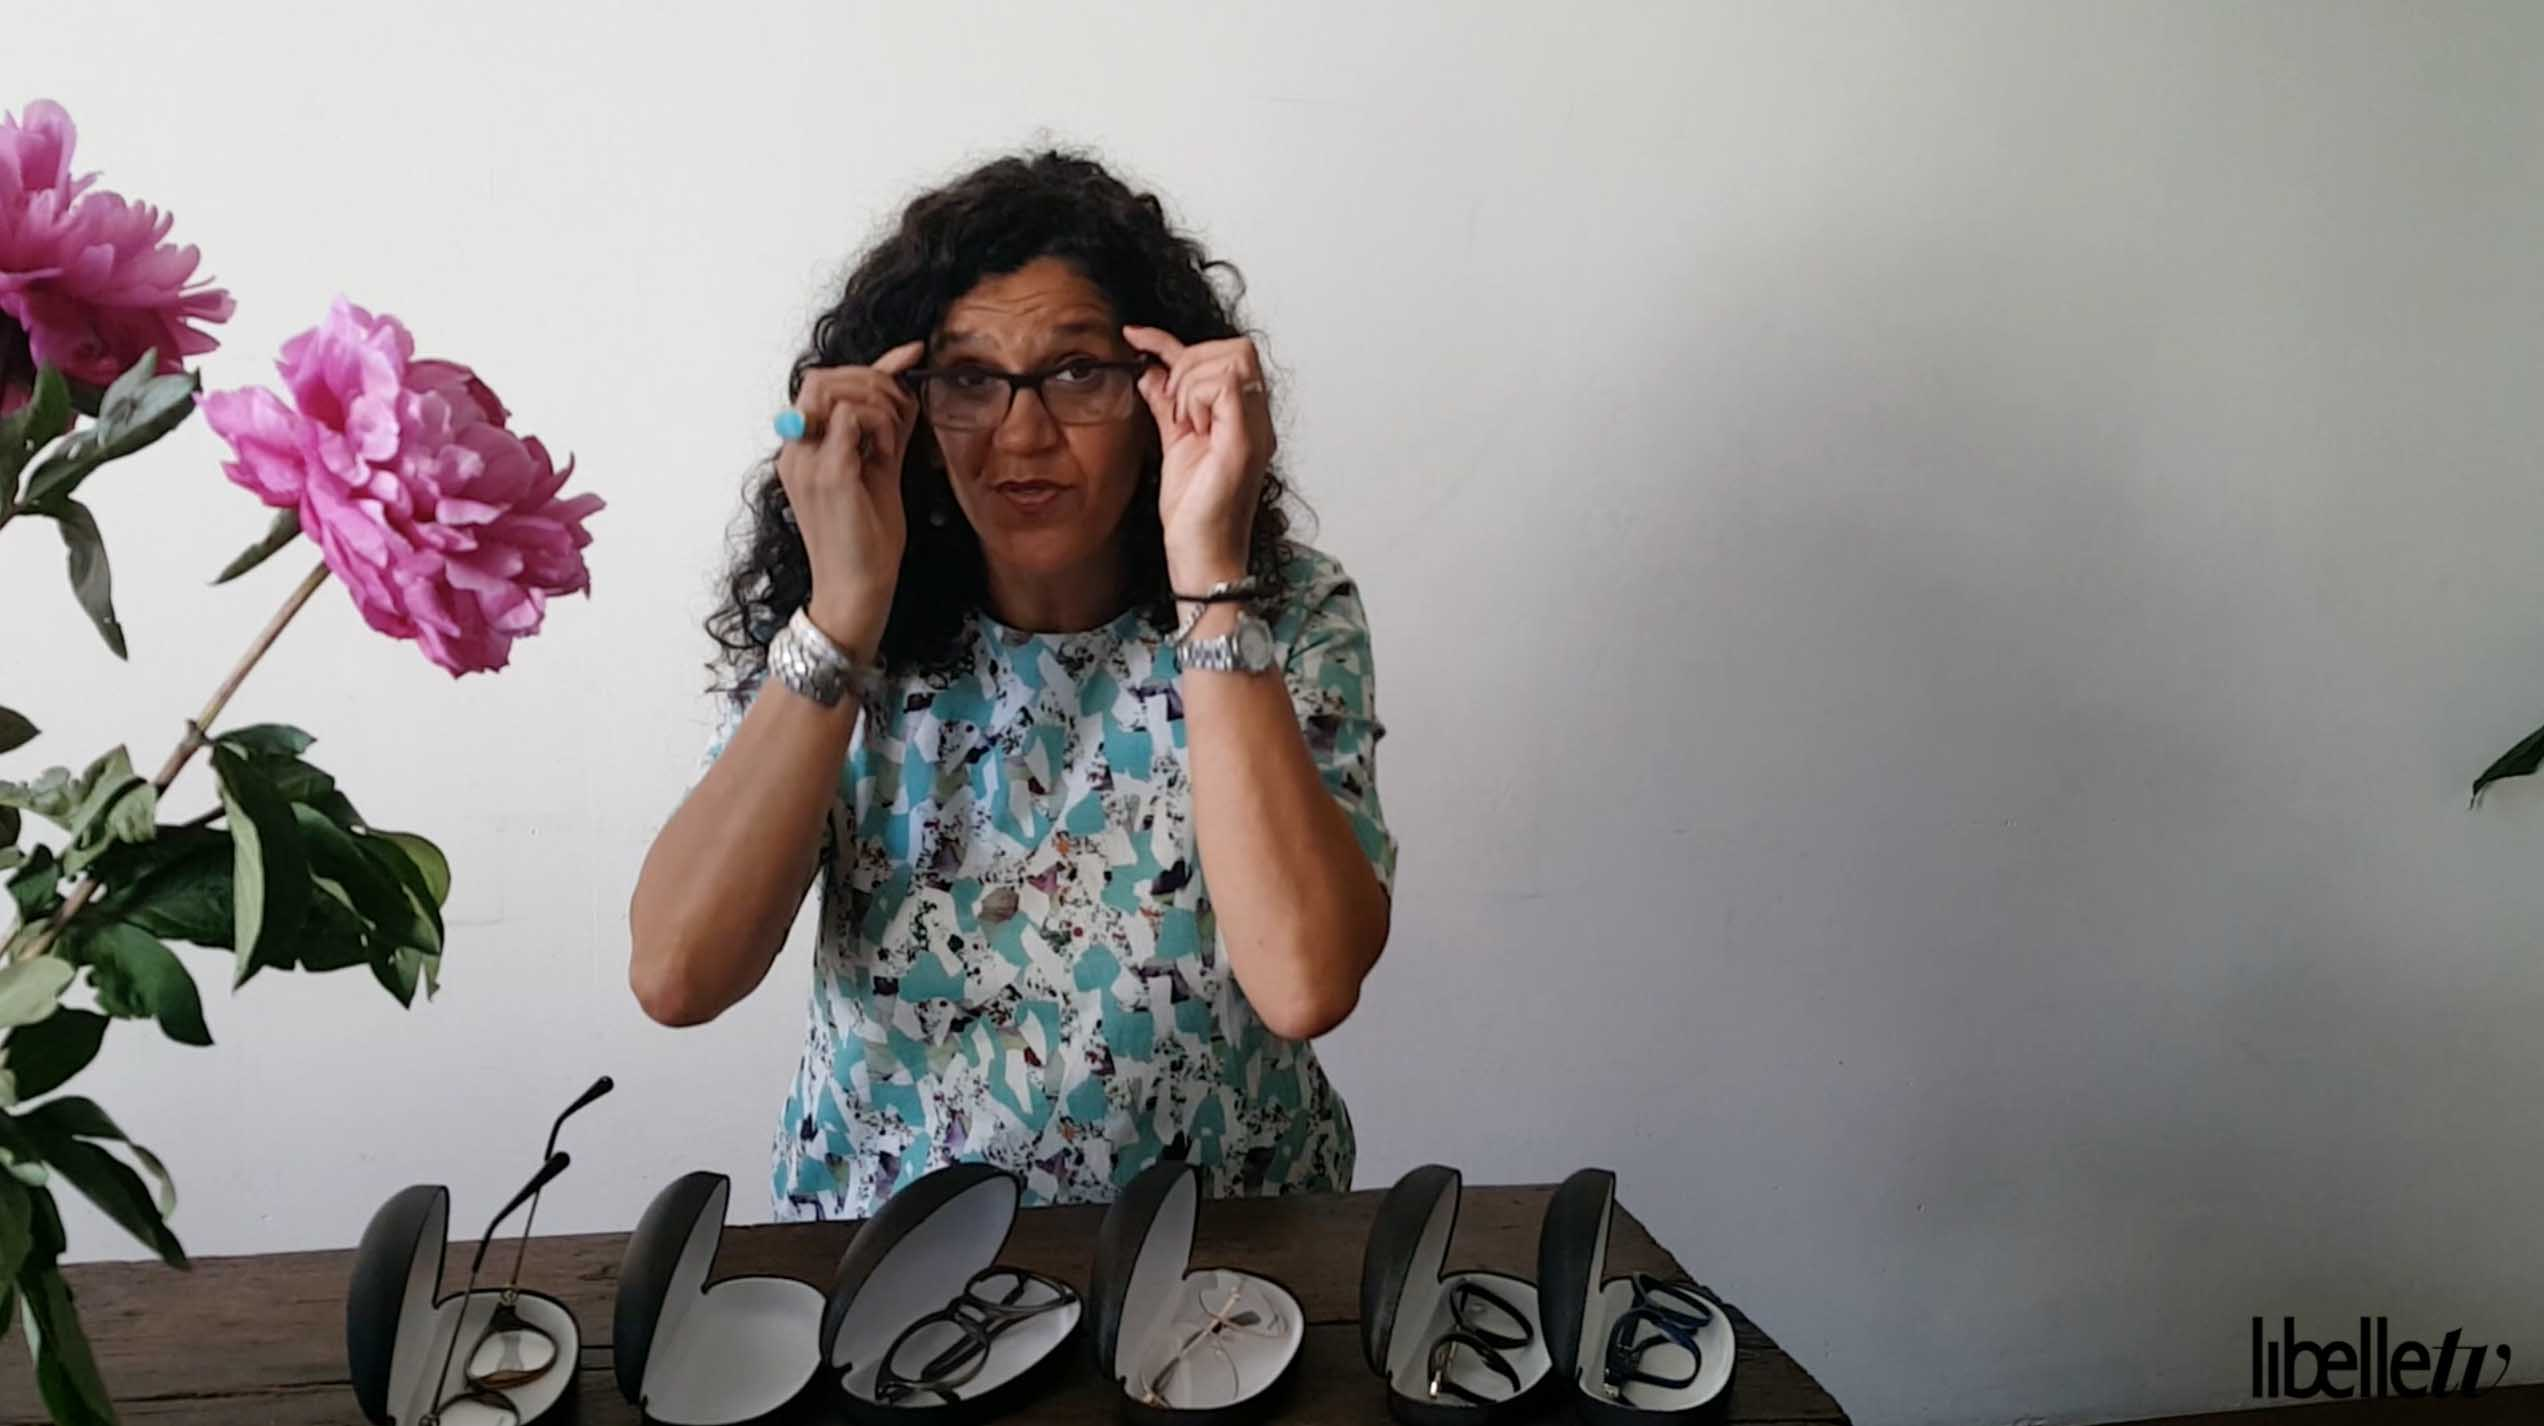 Francoise bril